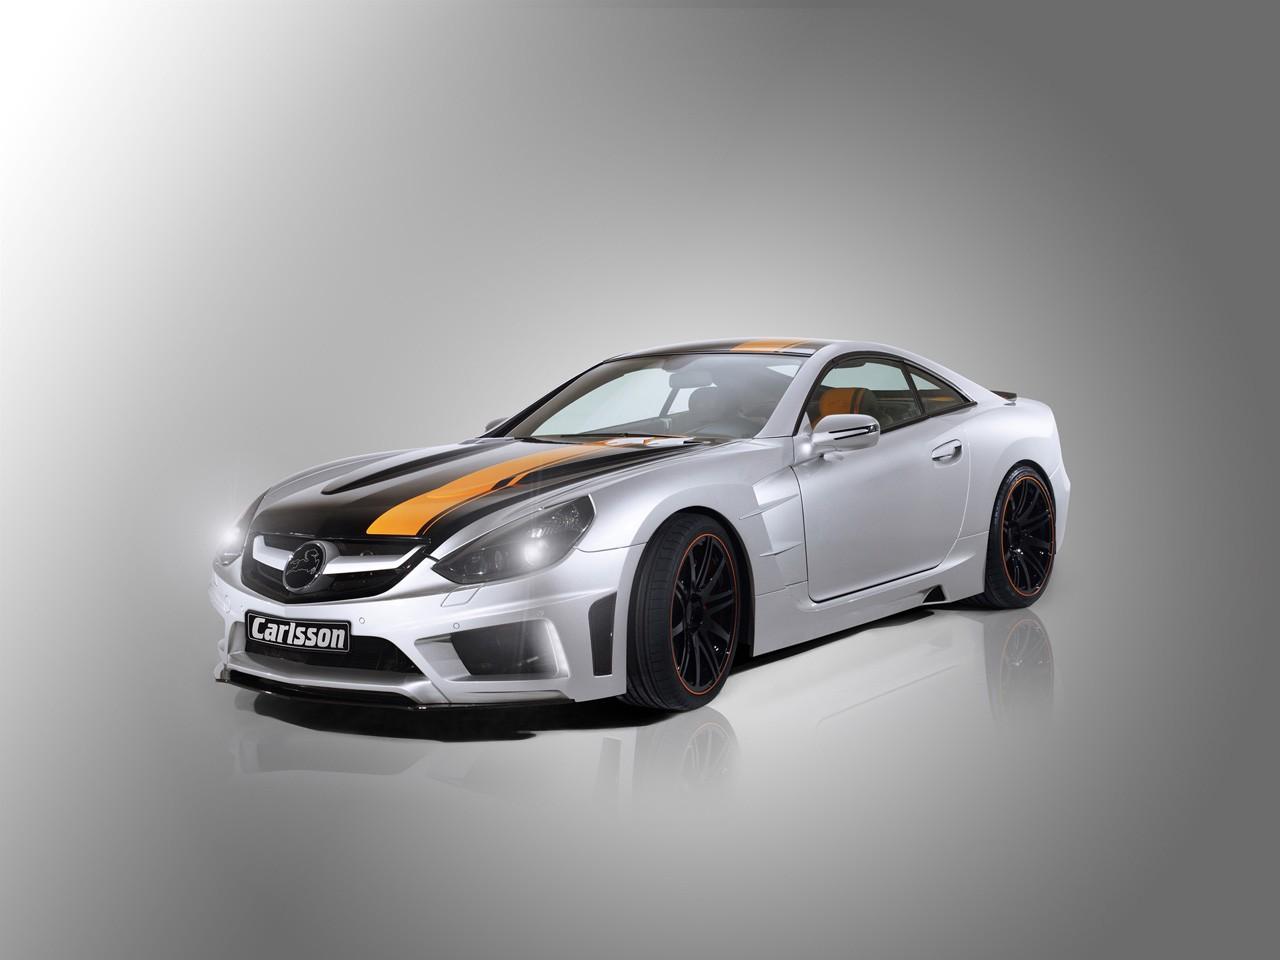 2010 Carlsson Mercedes C25